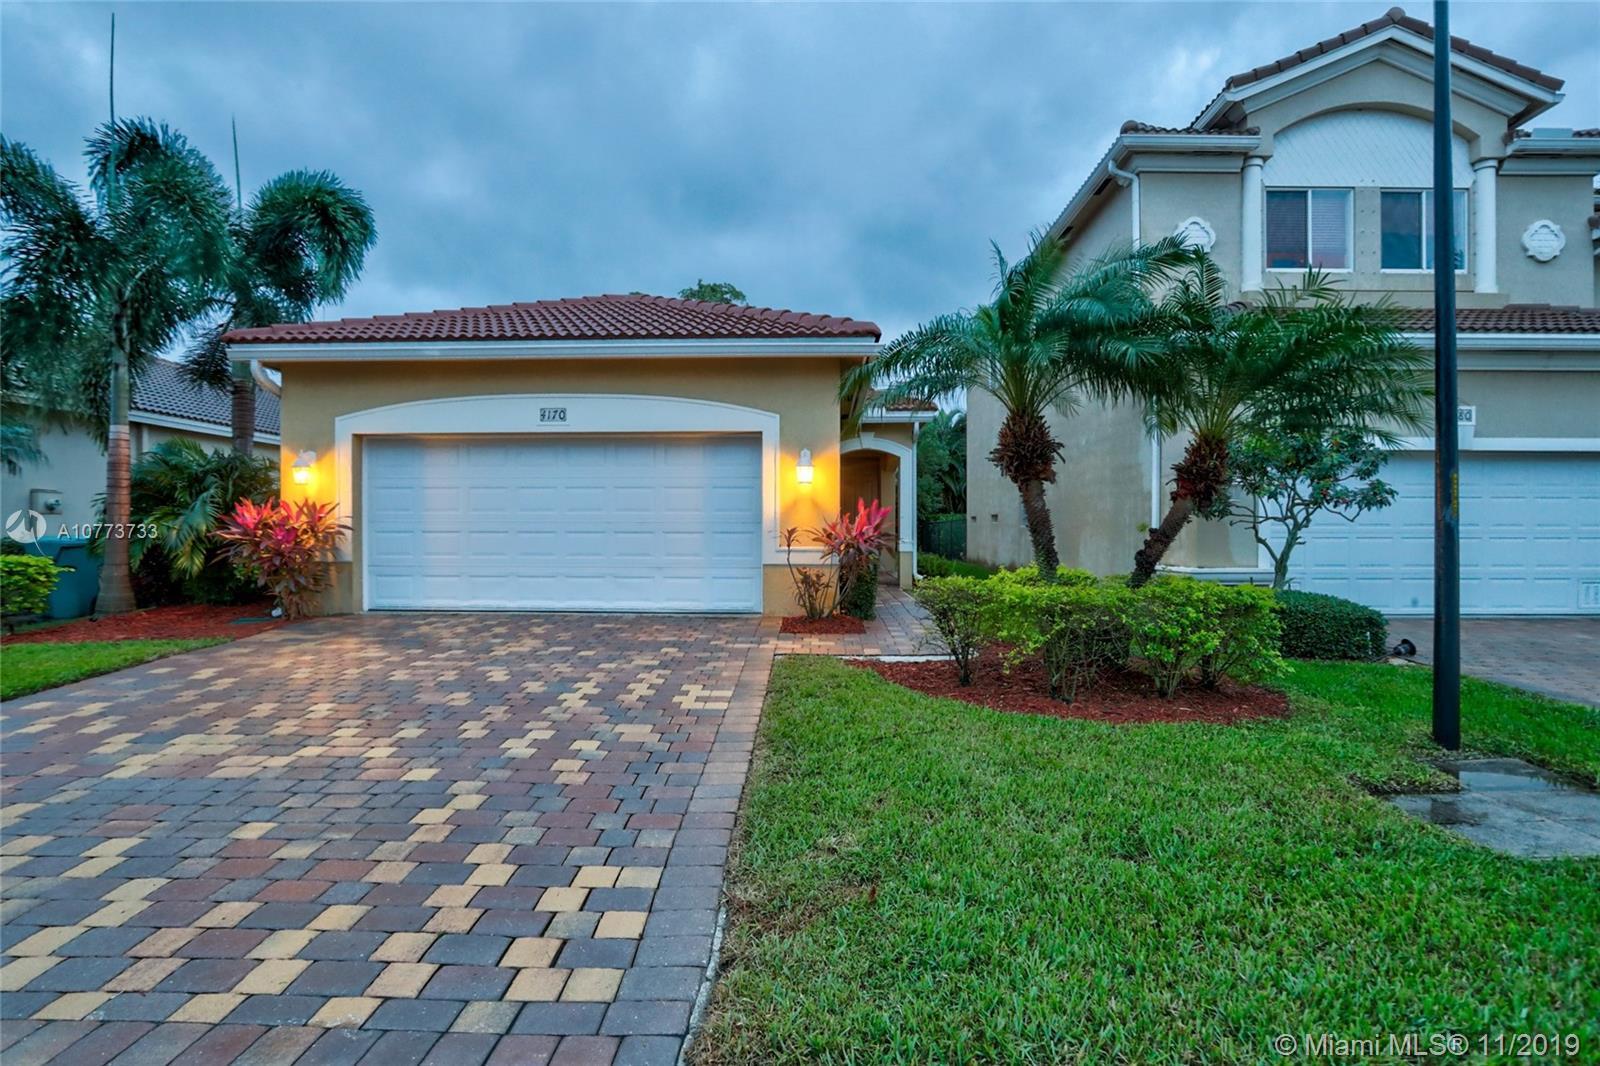 4170 Key Lime Blvd, Boynton Beach, FL 33436